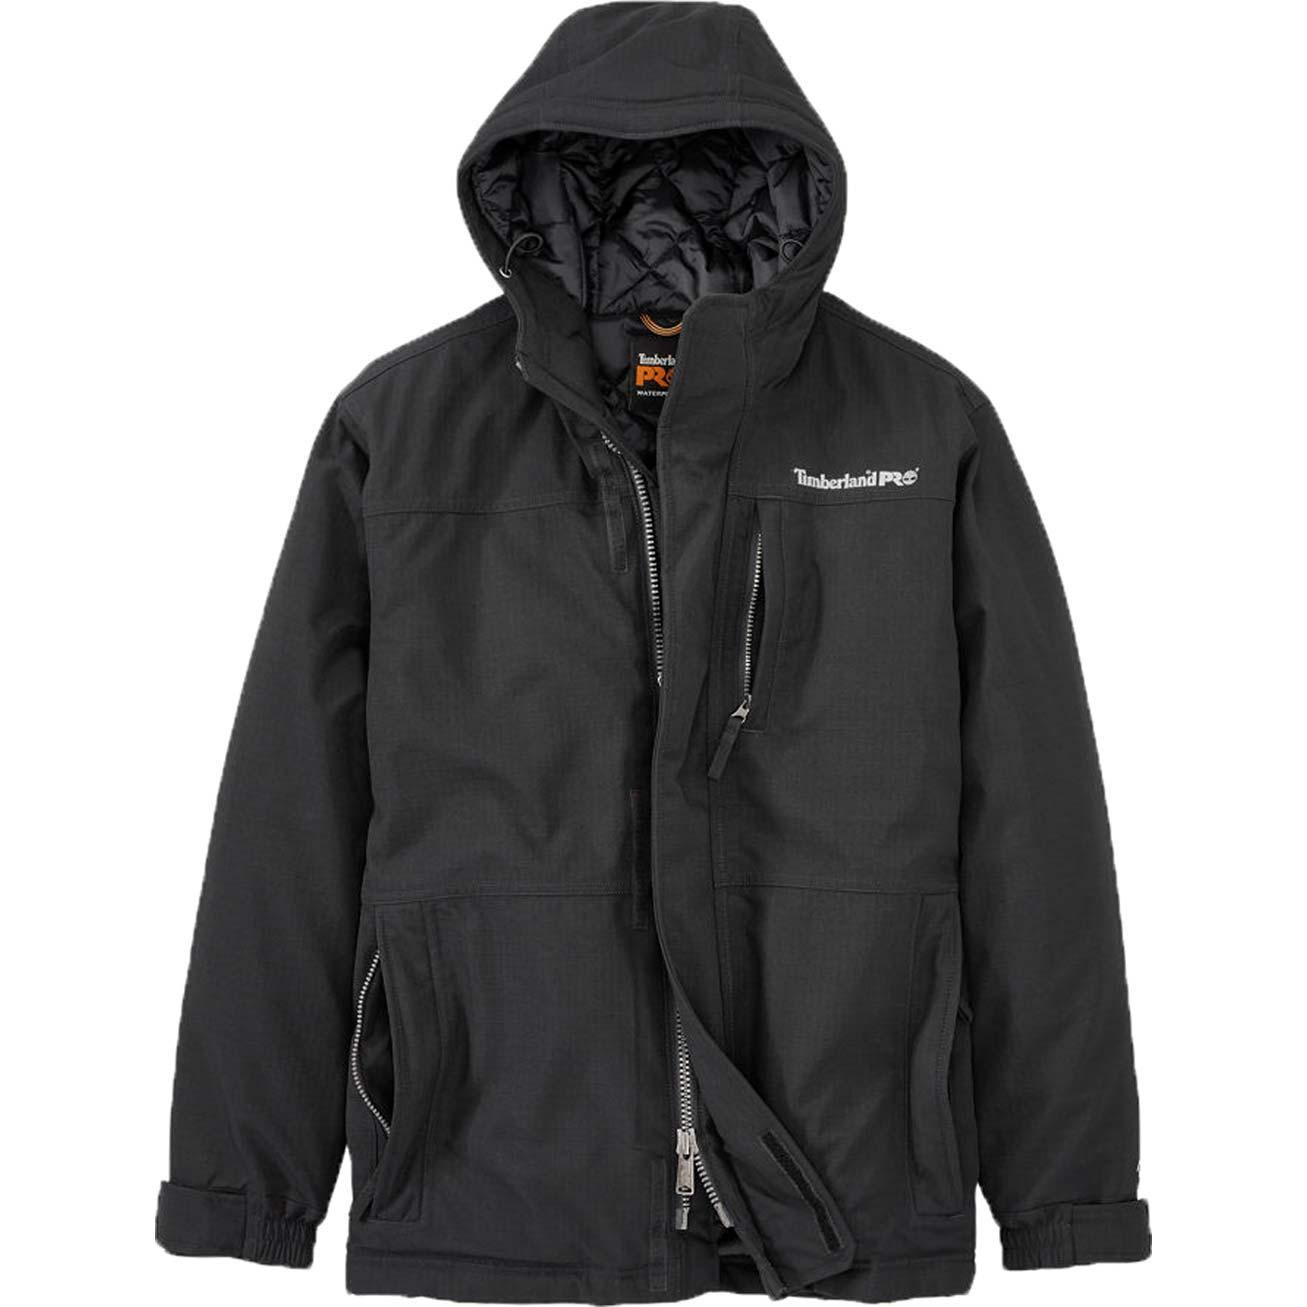 Timberland Pro Split System Waterproof Insulated Jacket